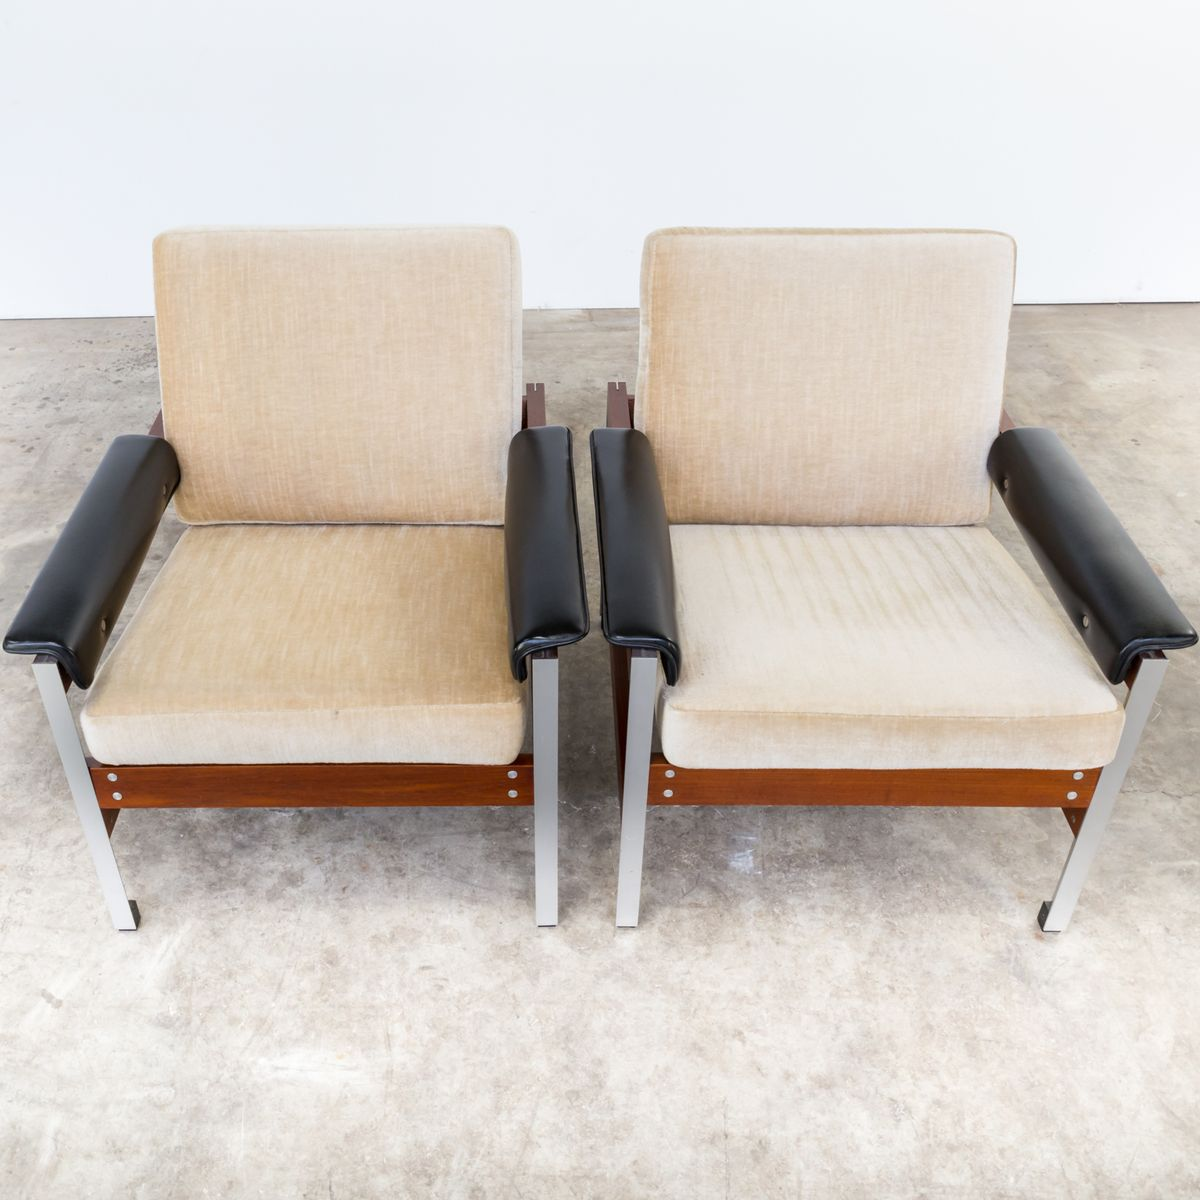 mid century sessel aus teak kunstleder stoff und aluminium 2er set bei pamono kaufen. Black Bedroom Furniture Sets. Home Design Ideas